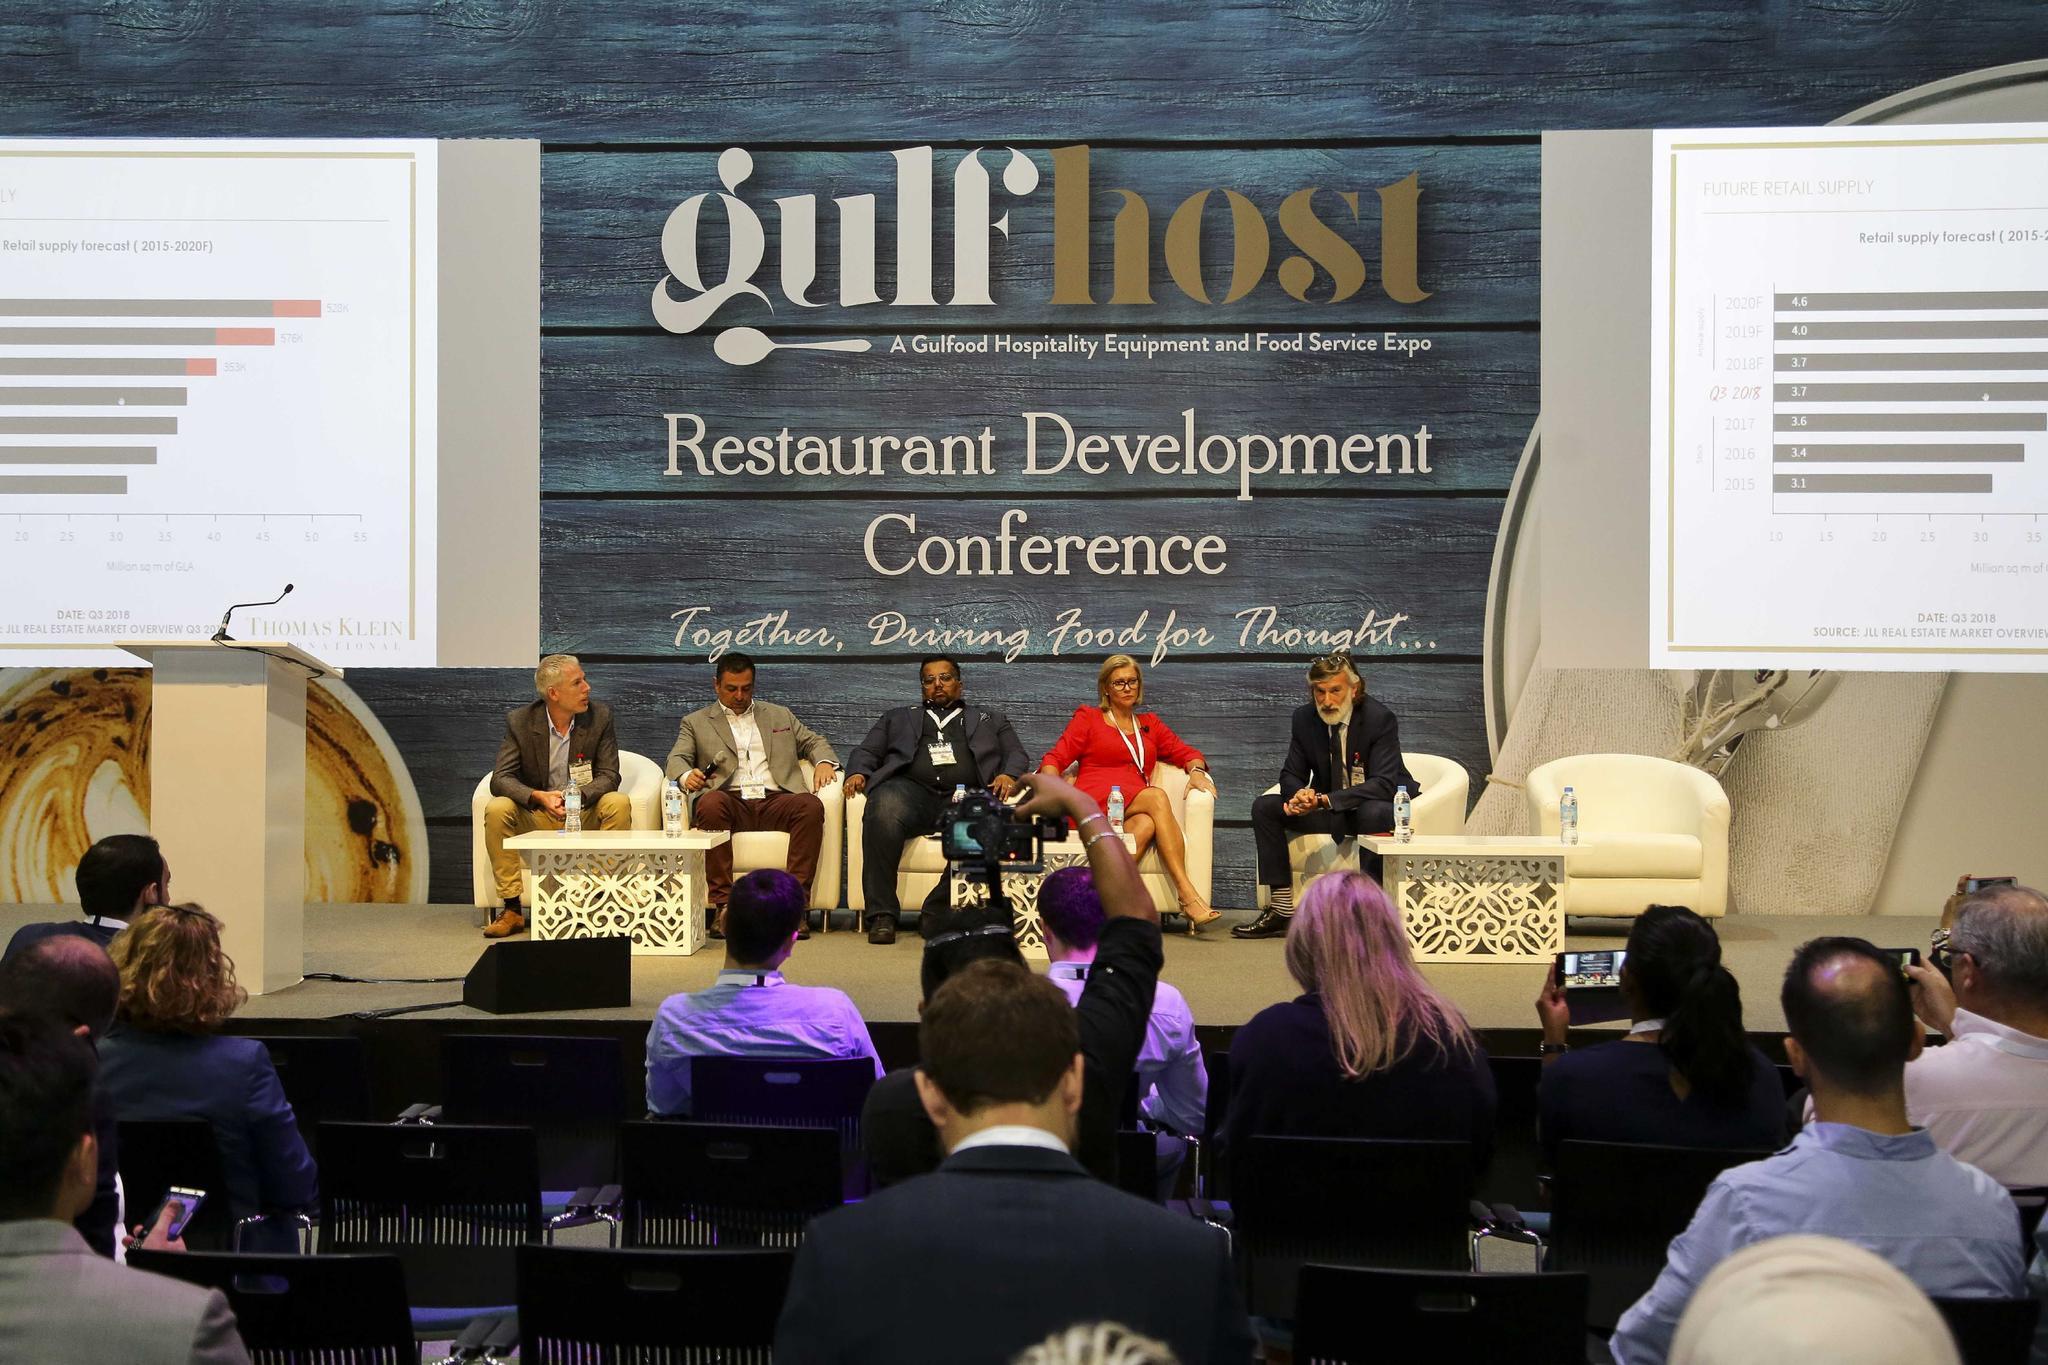 Restaurant Development Conference